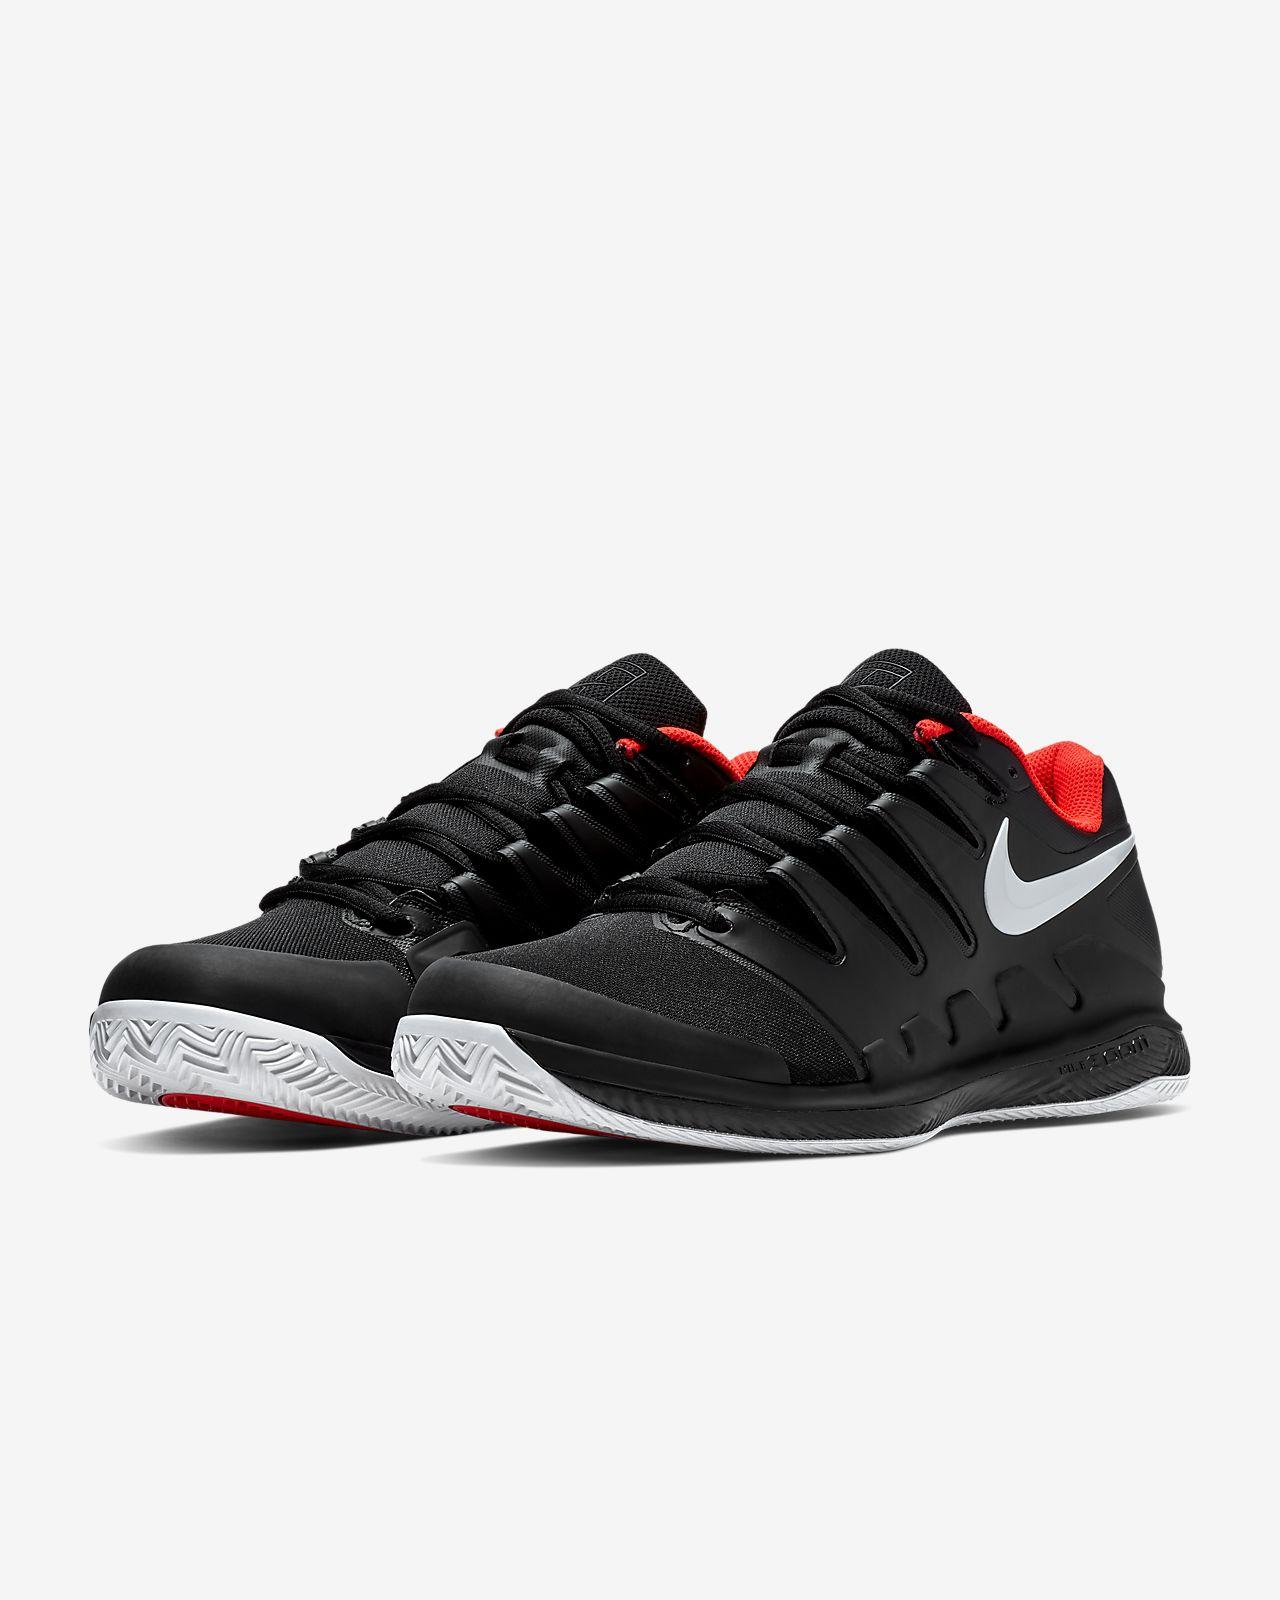 19db30e0860 ... NikeCourt Air Zoom Vapor X Zapatillas de tenis para tierra batida -  Hombre